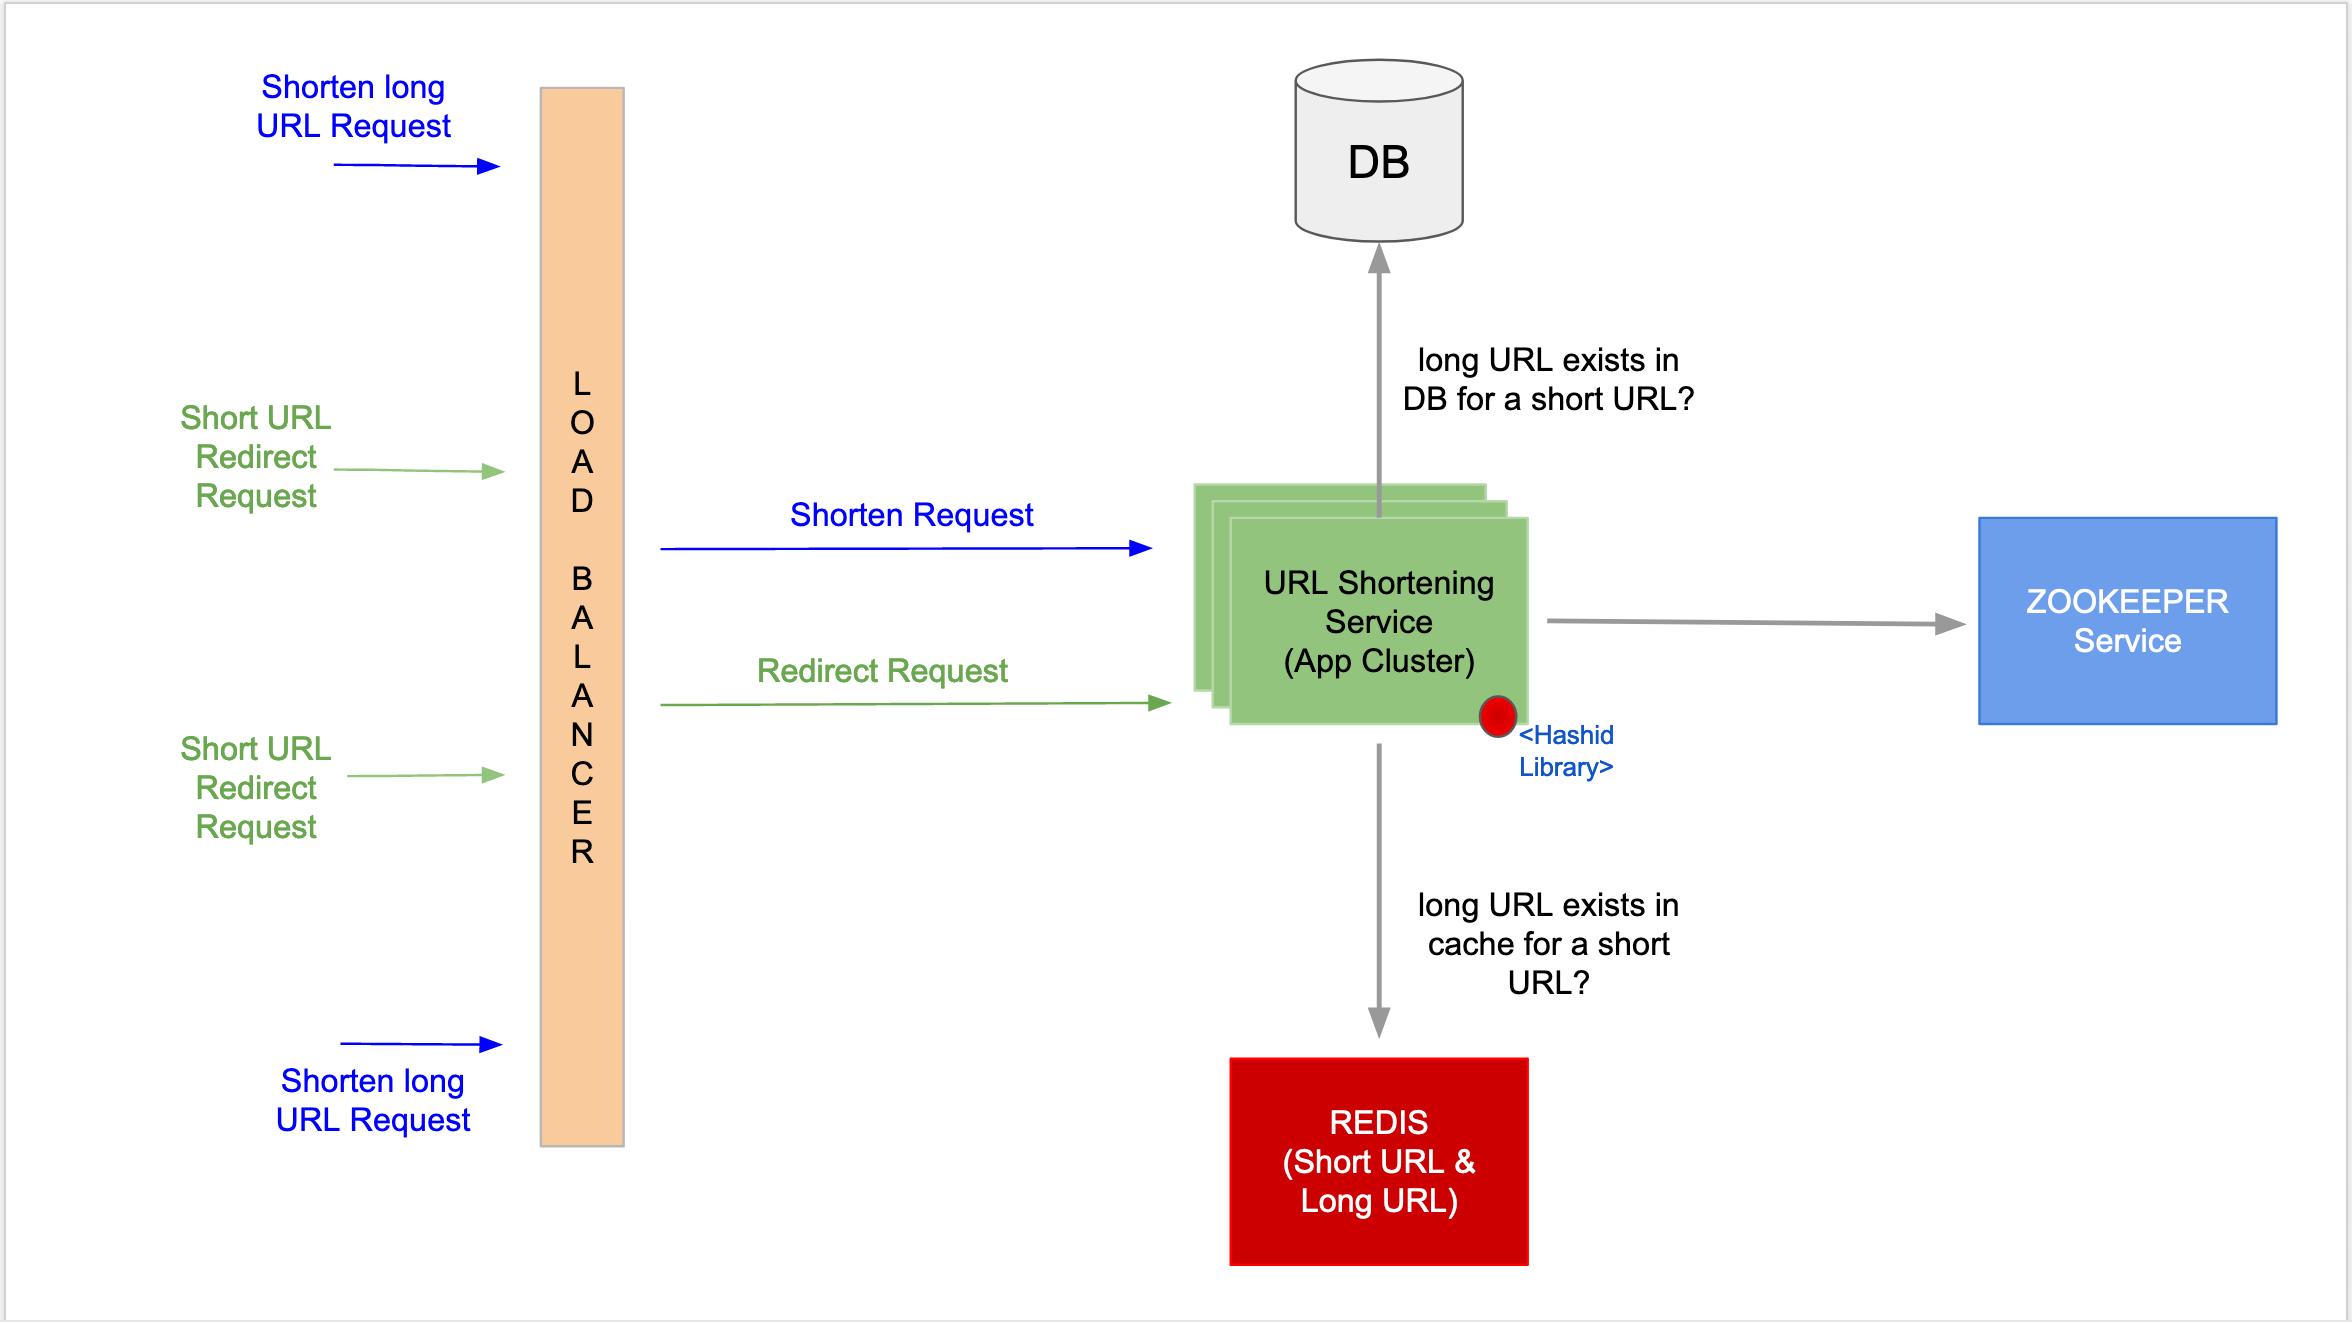 Final architectural diagram